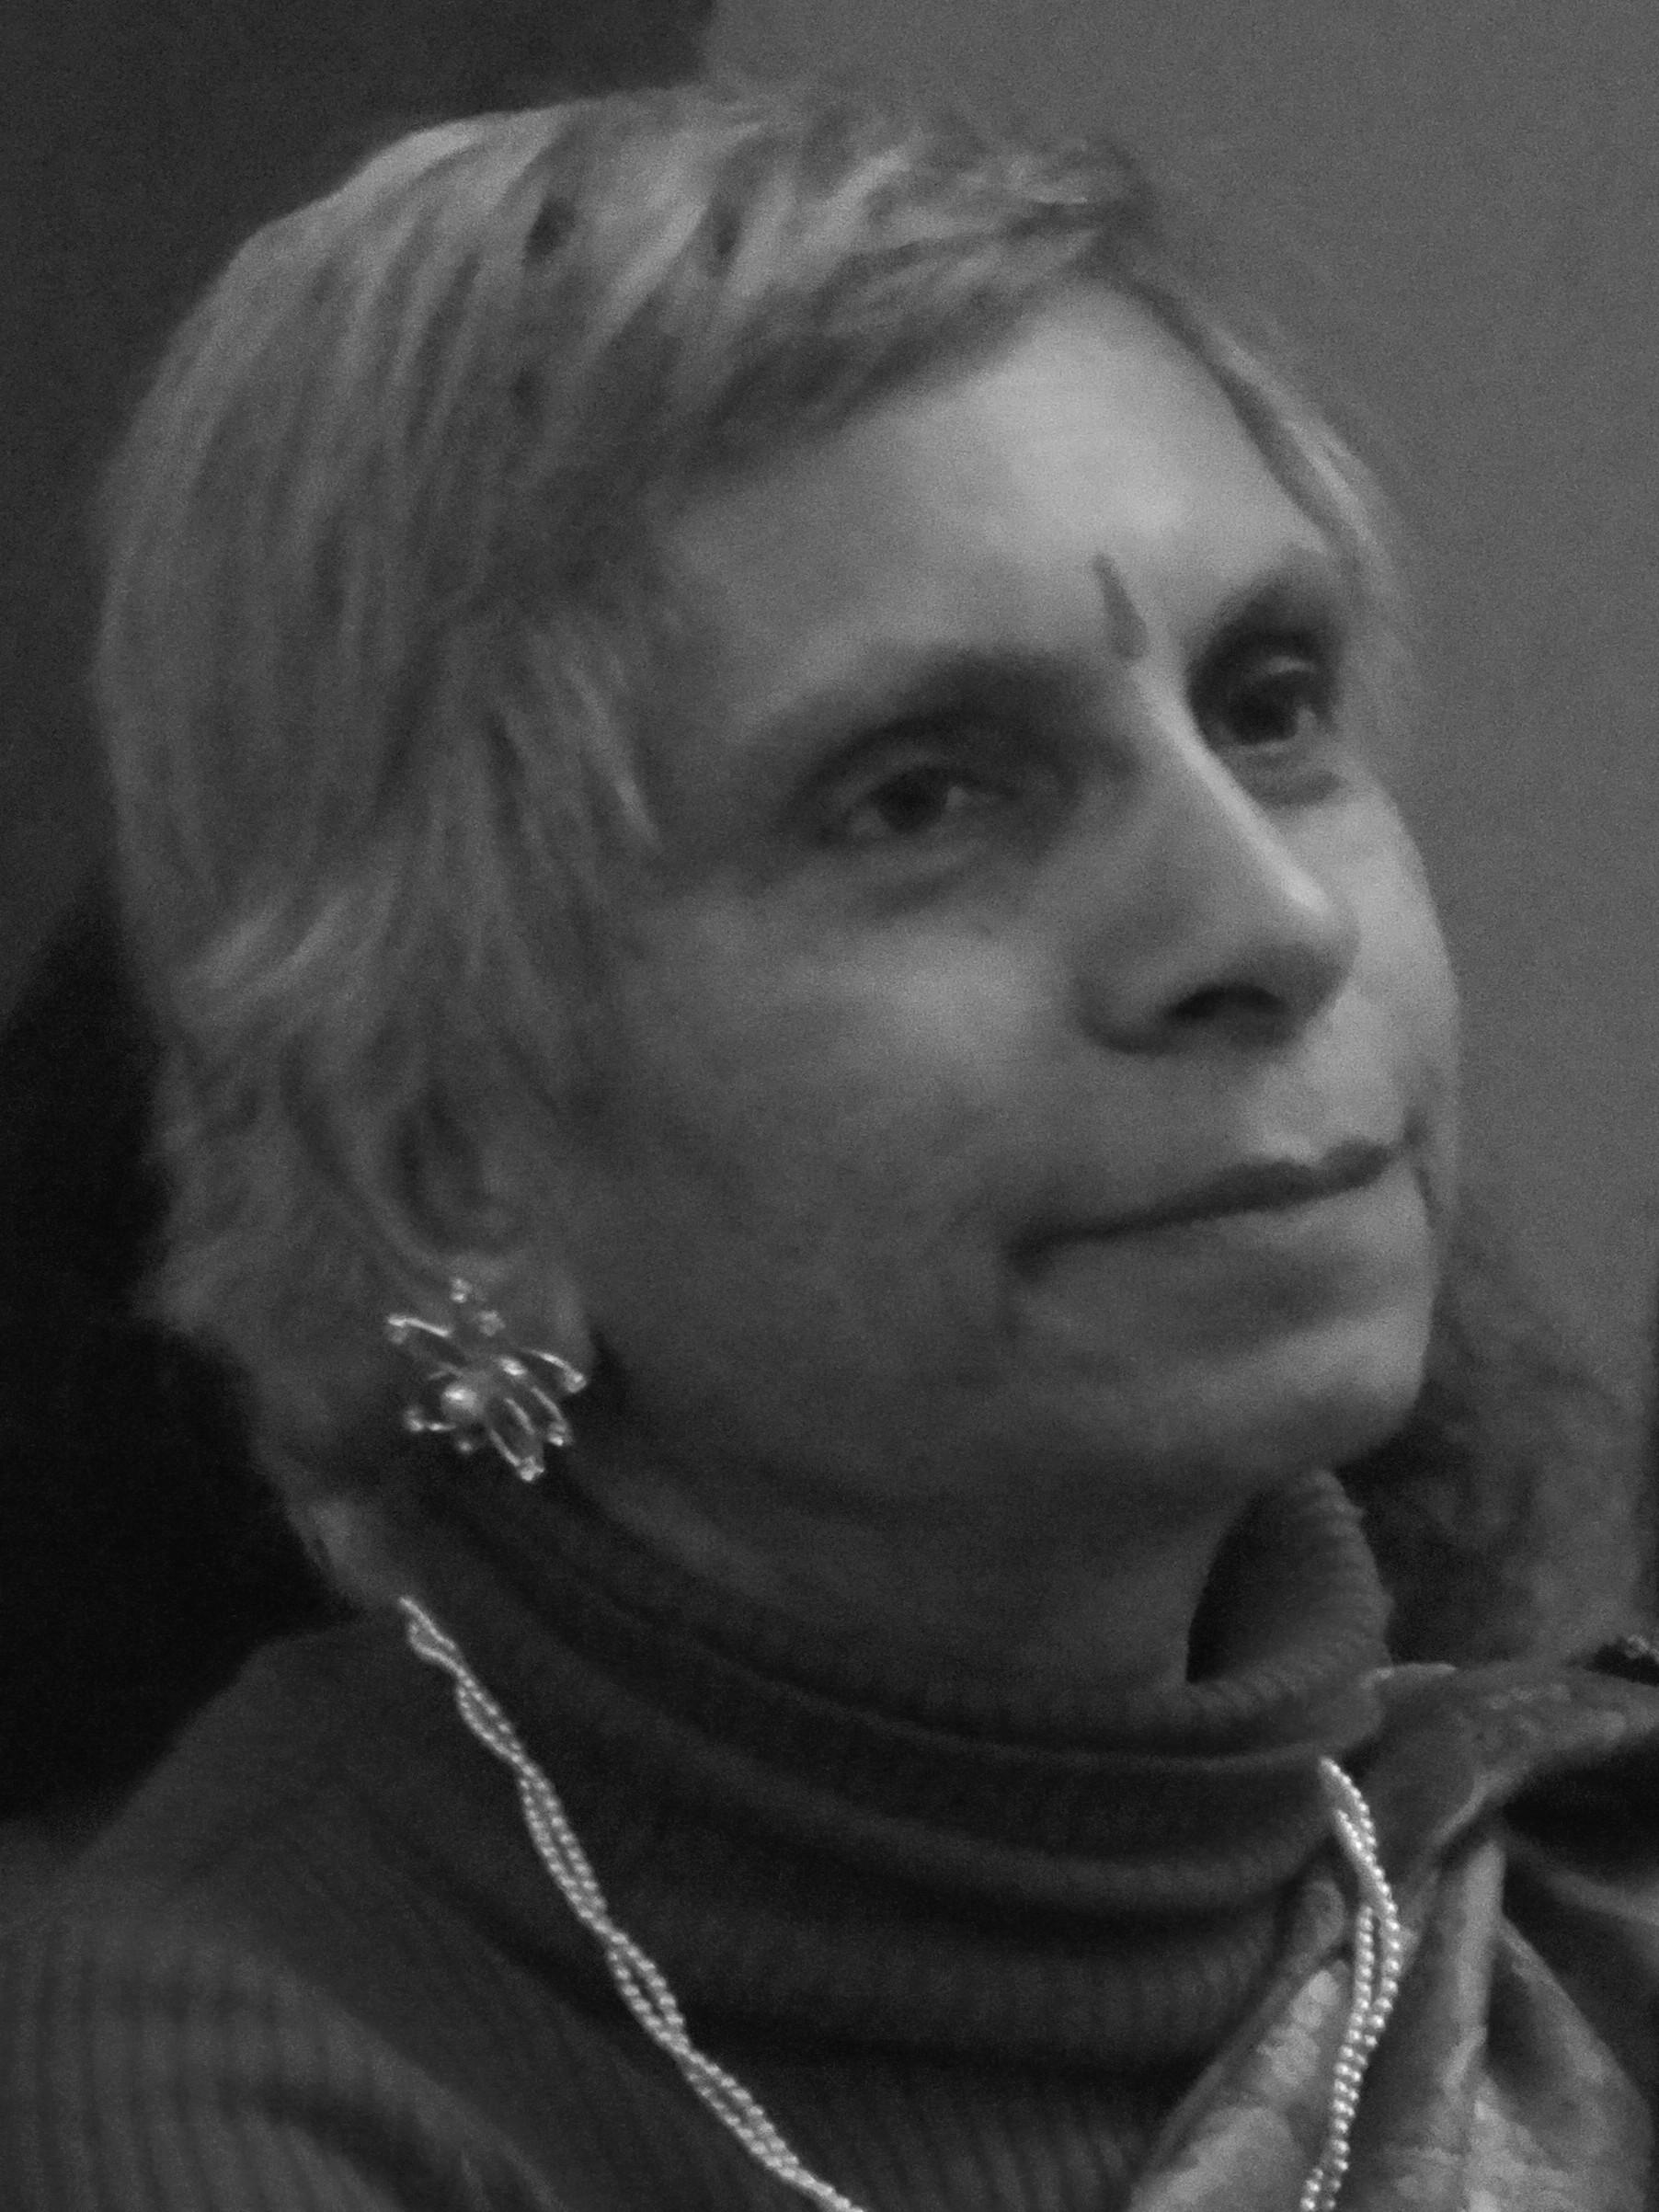 Debjani Chatterjee, MBE